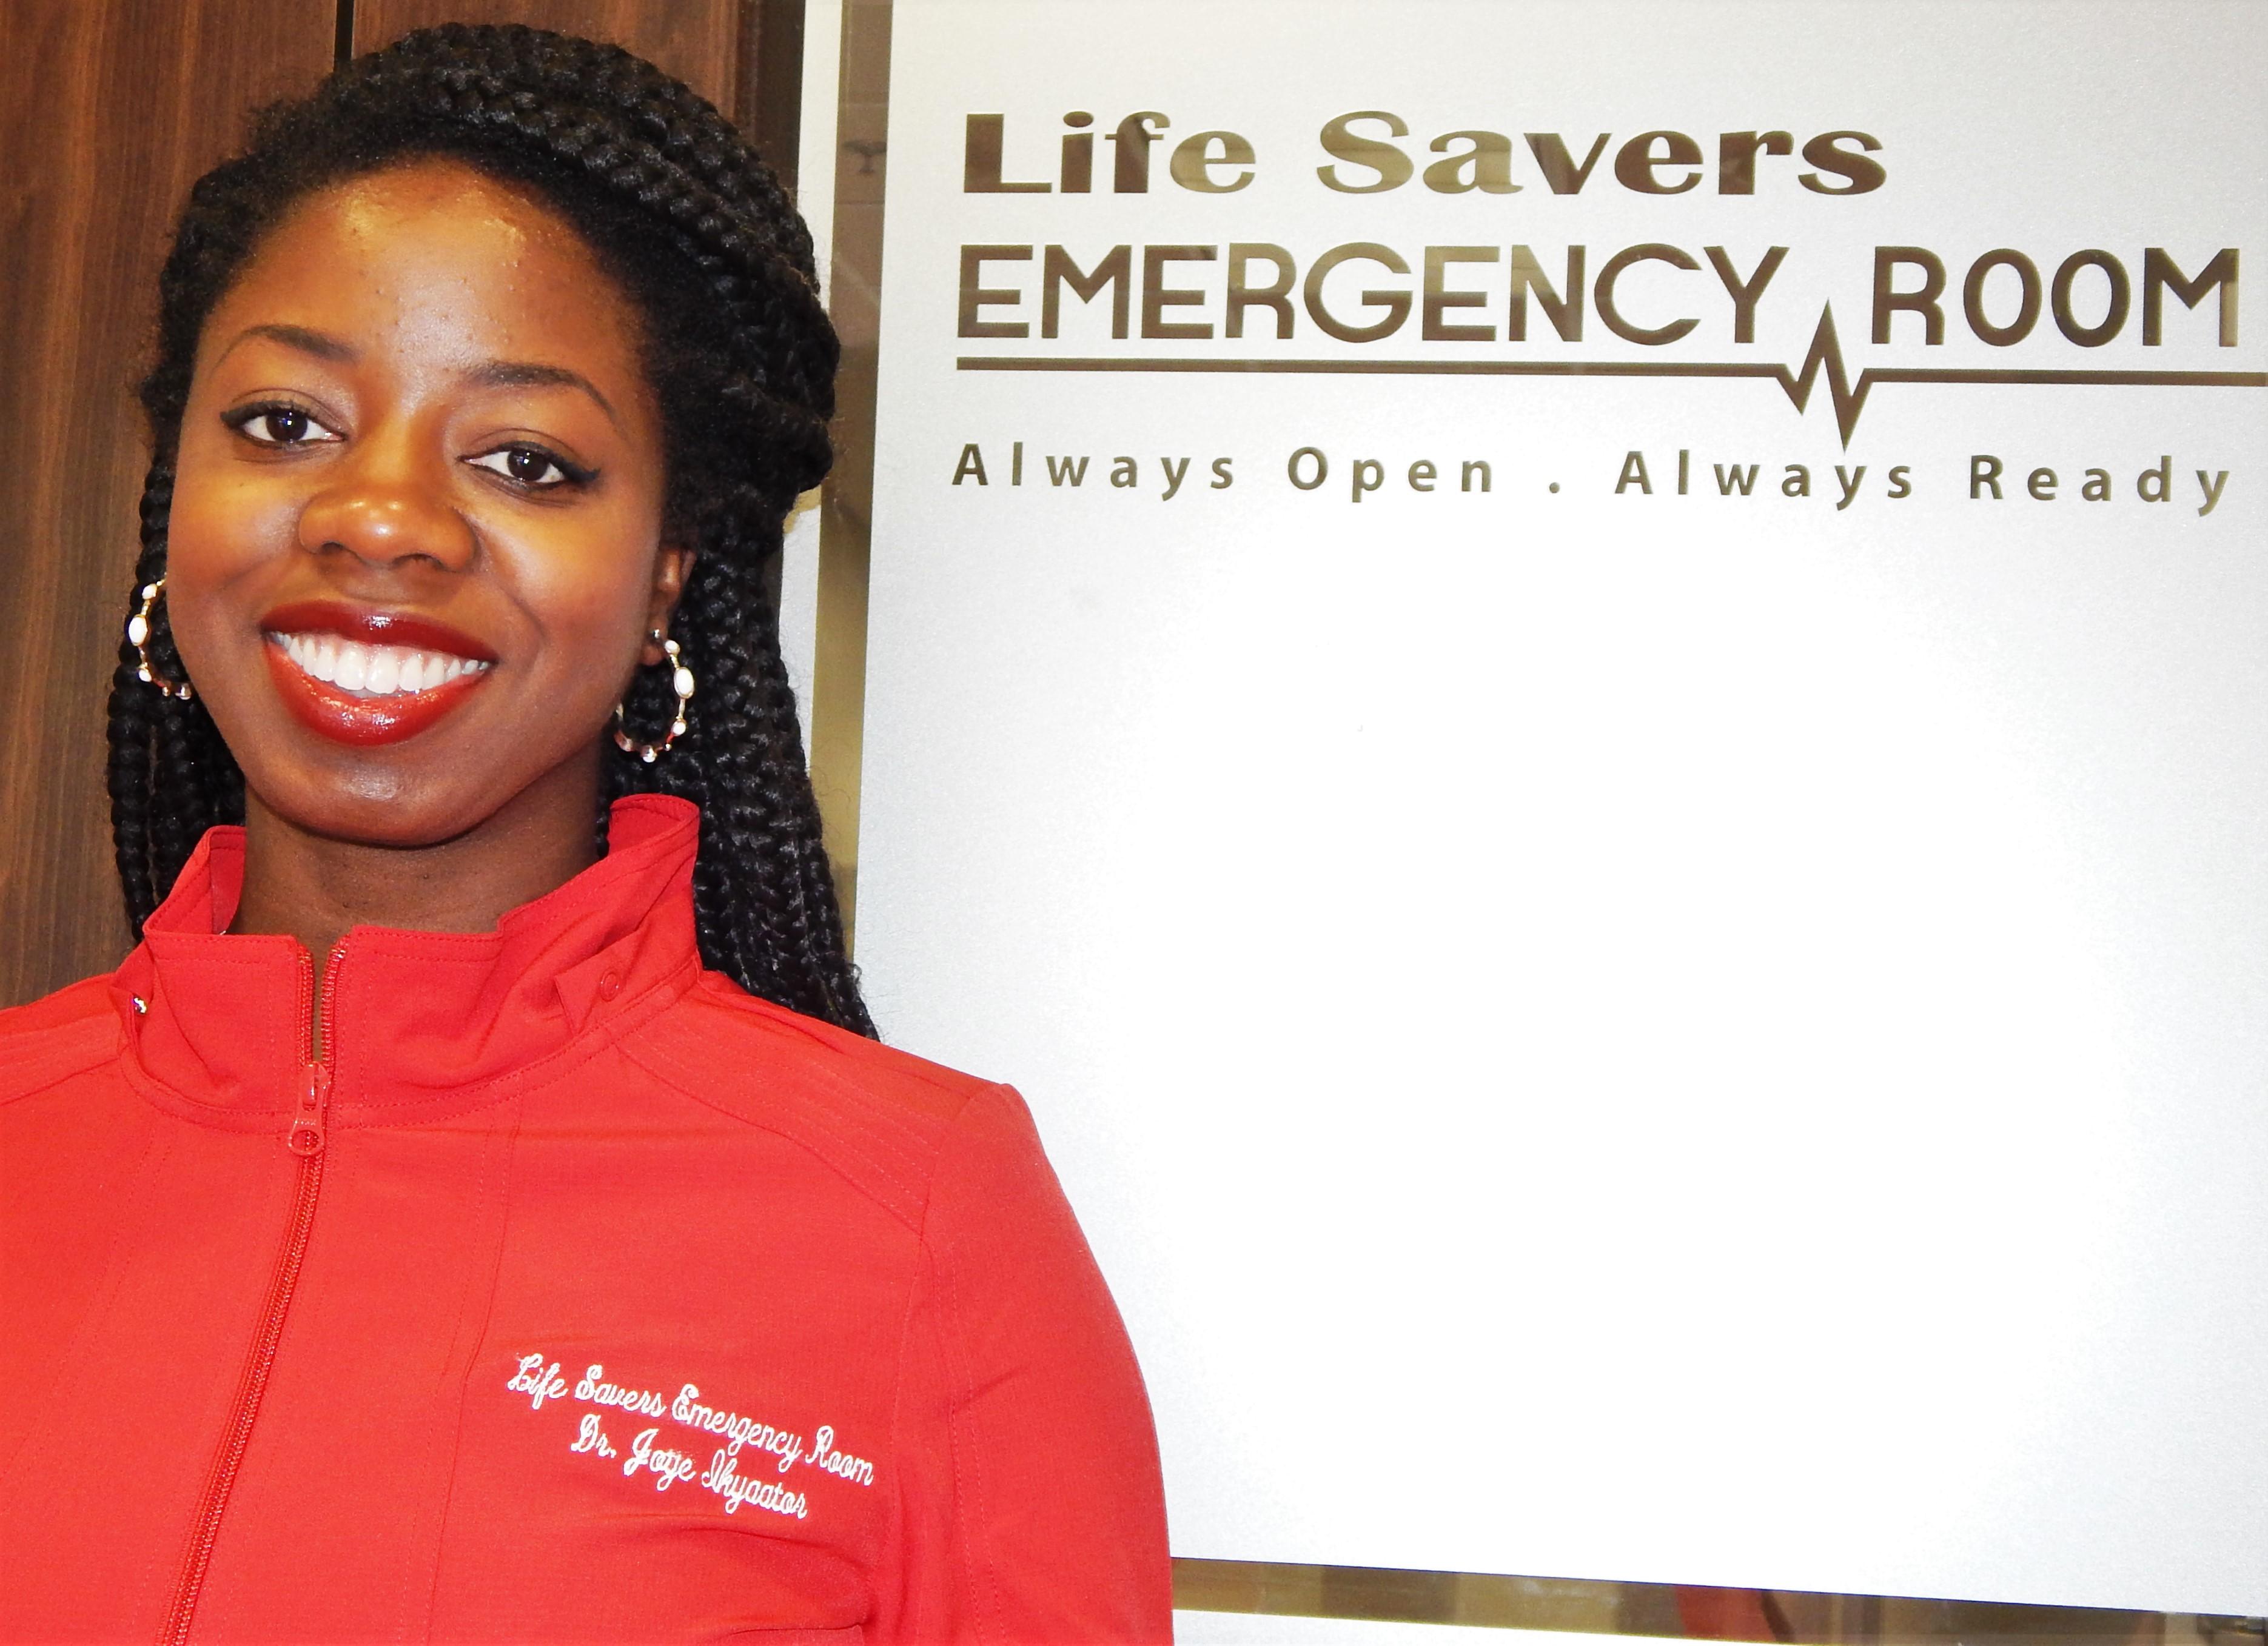 Lifesavers ER